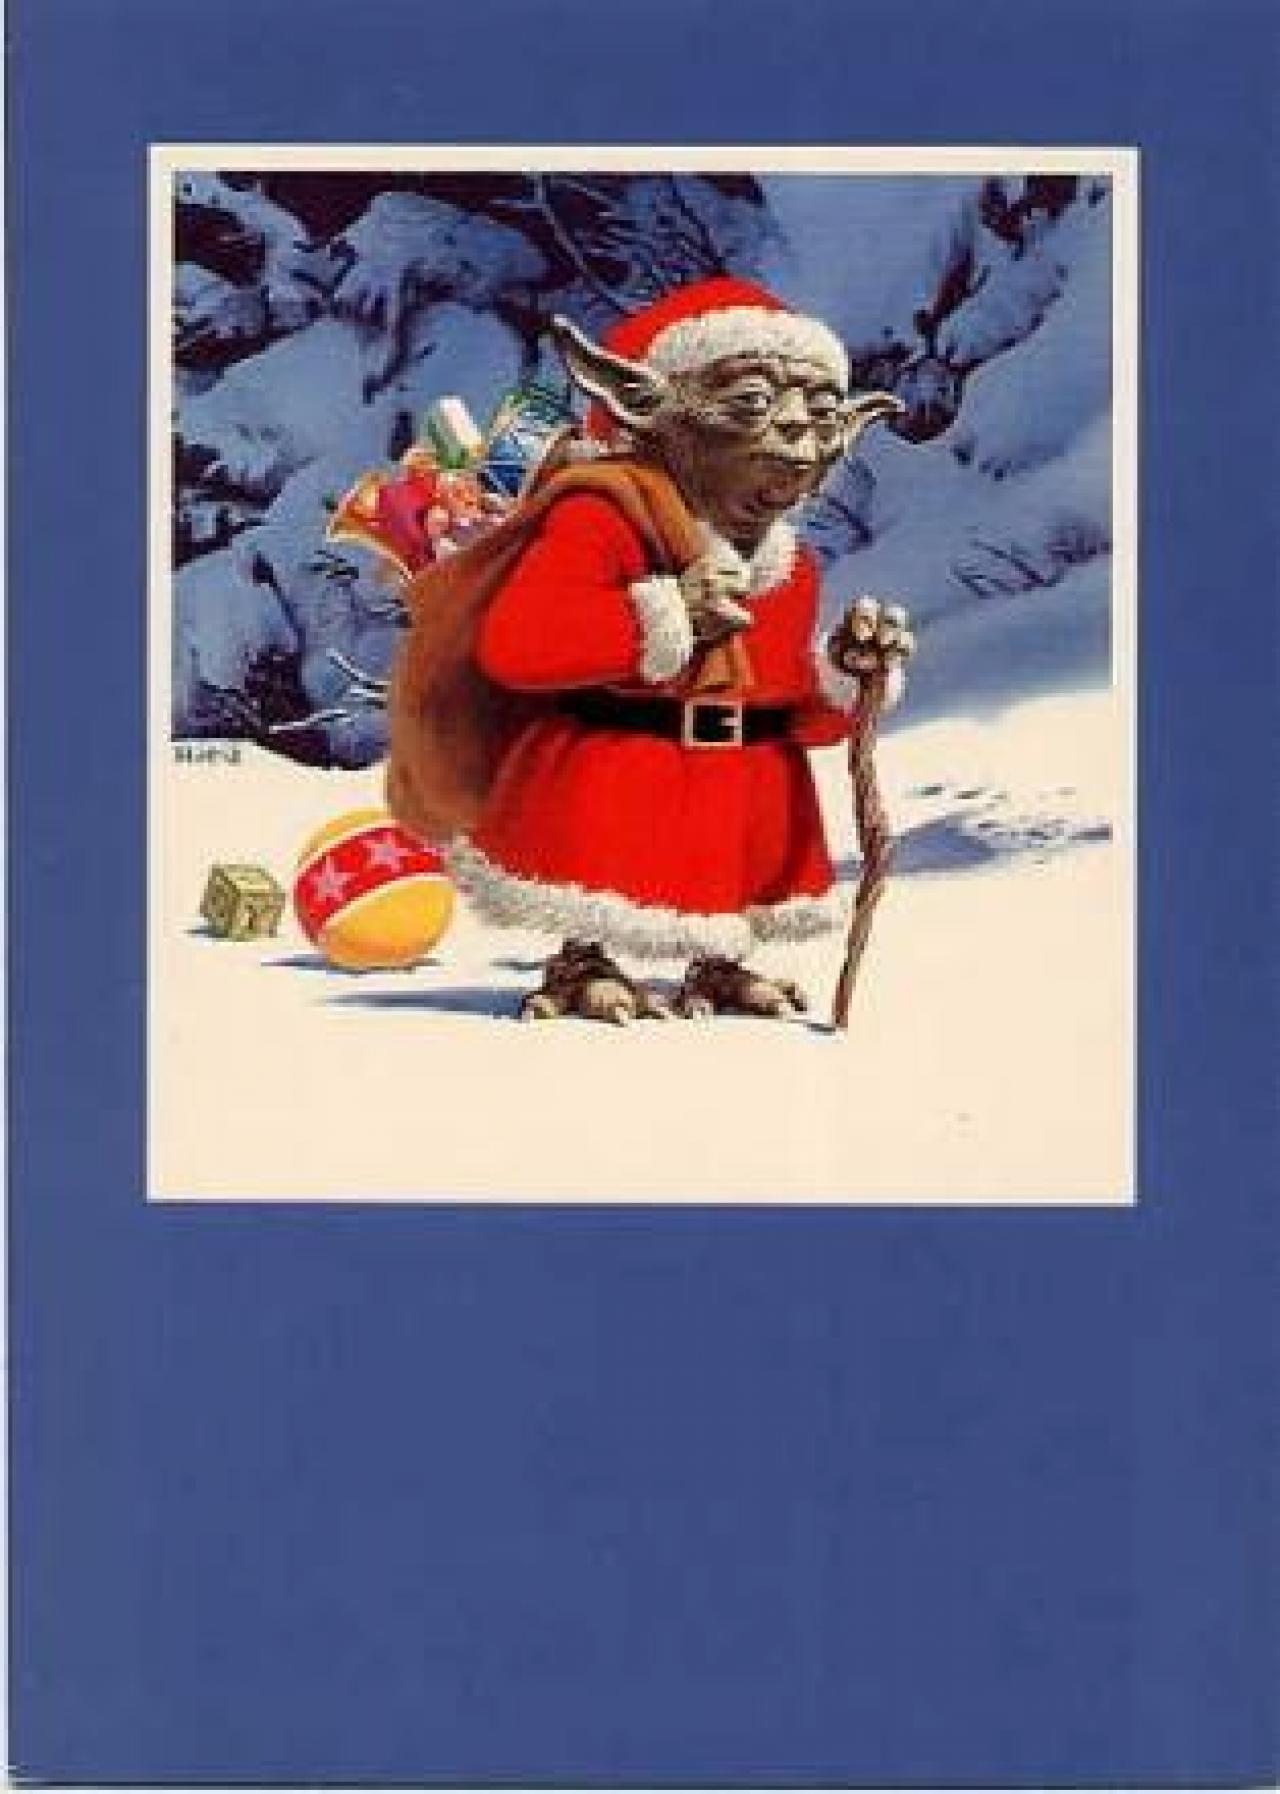 #BE140D 34 Amazing Star Wars Christmas Cards You Wish George Lucas  5515 decorations de noel star wars 1280x1794 px @ aertt.com